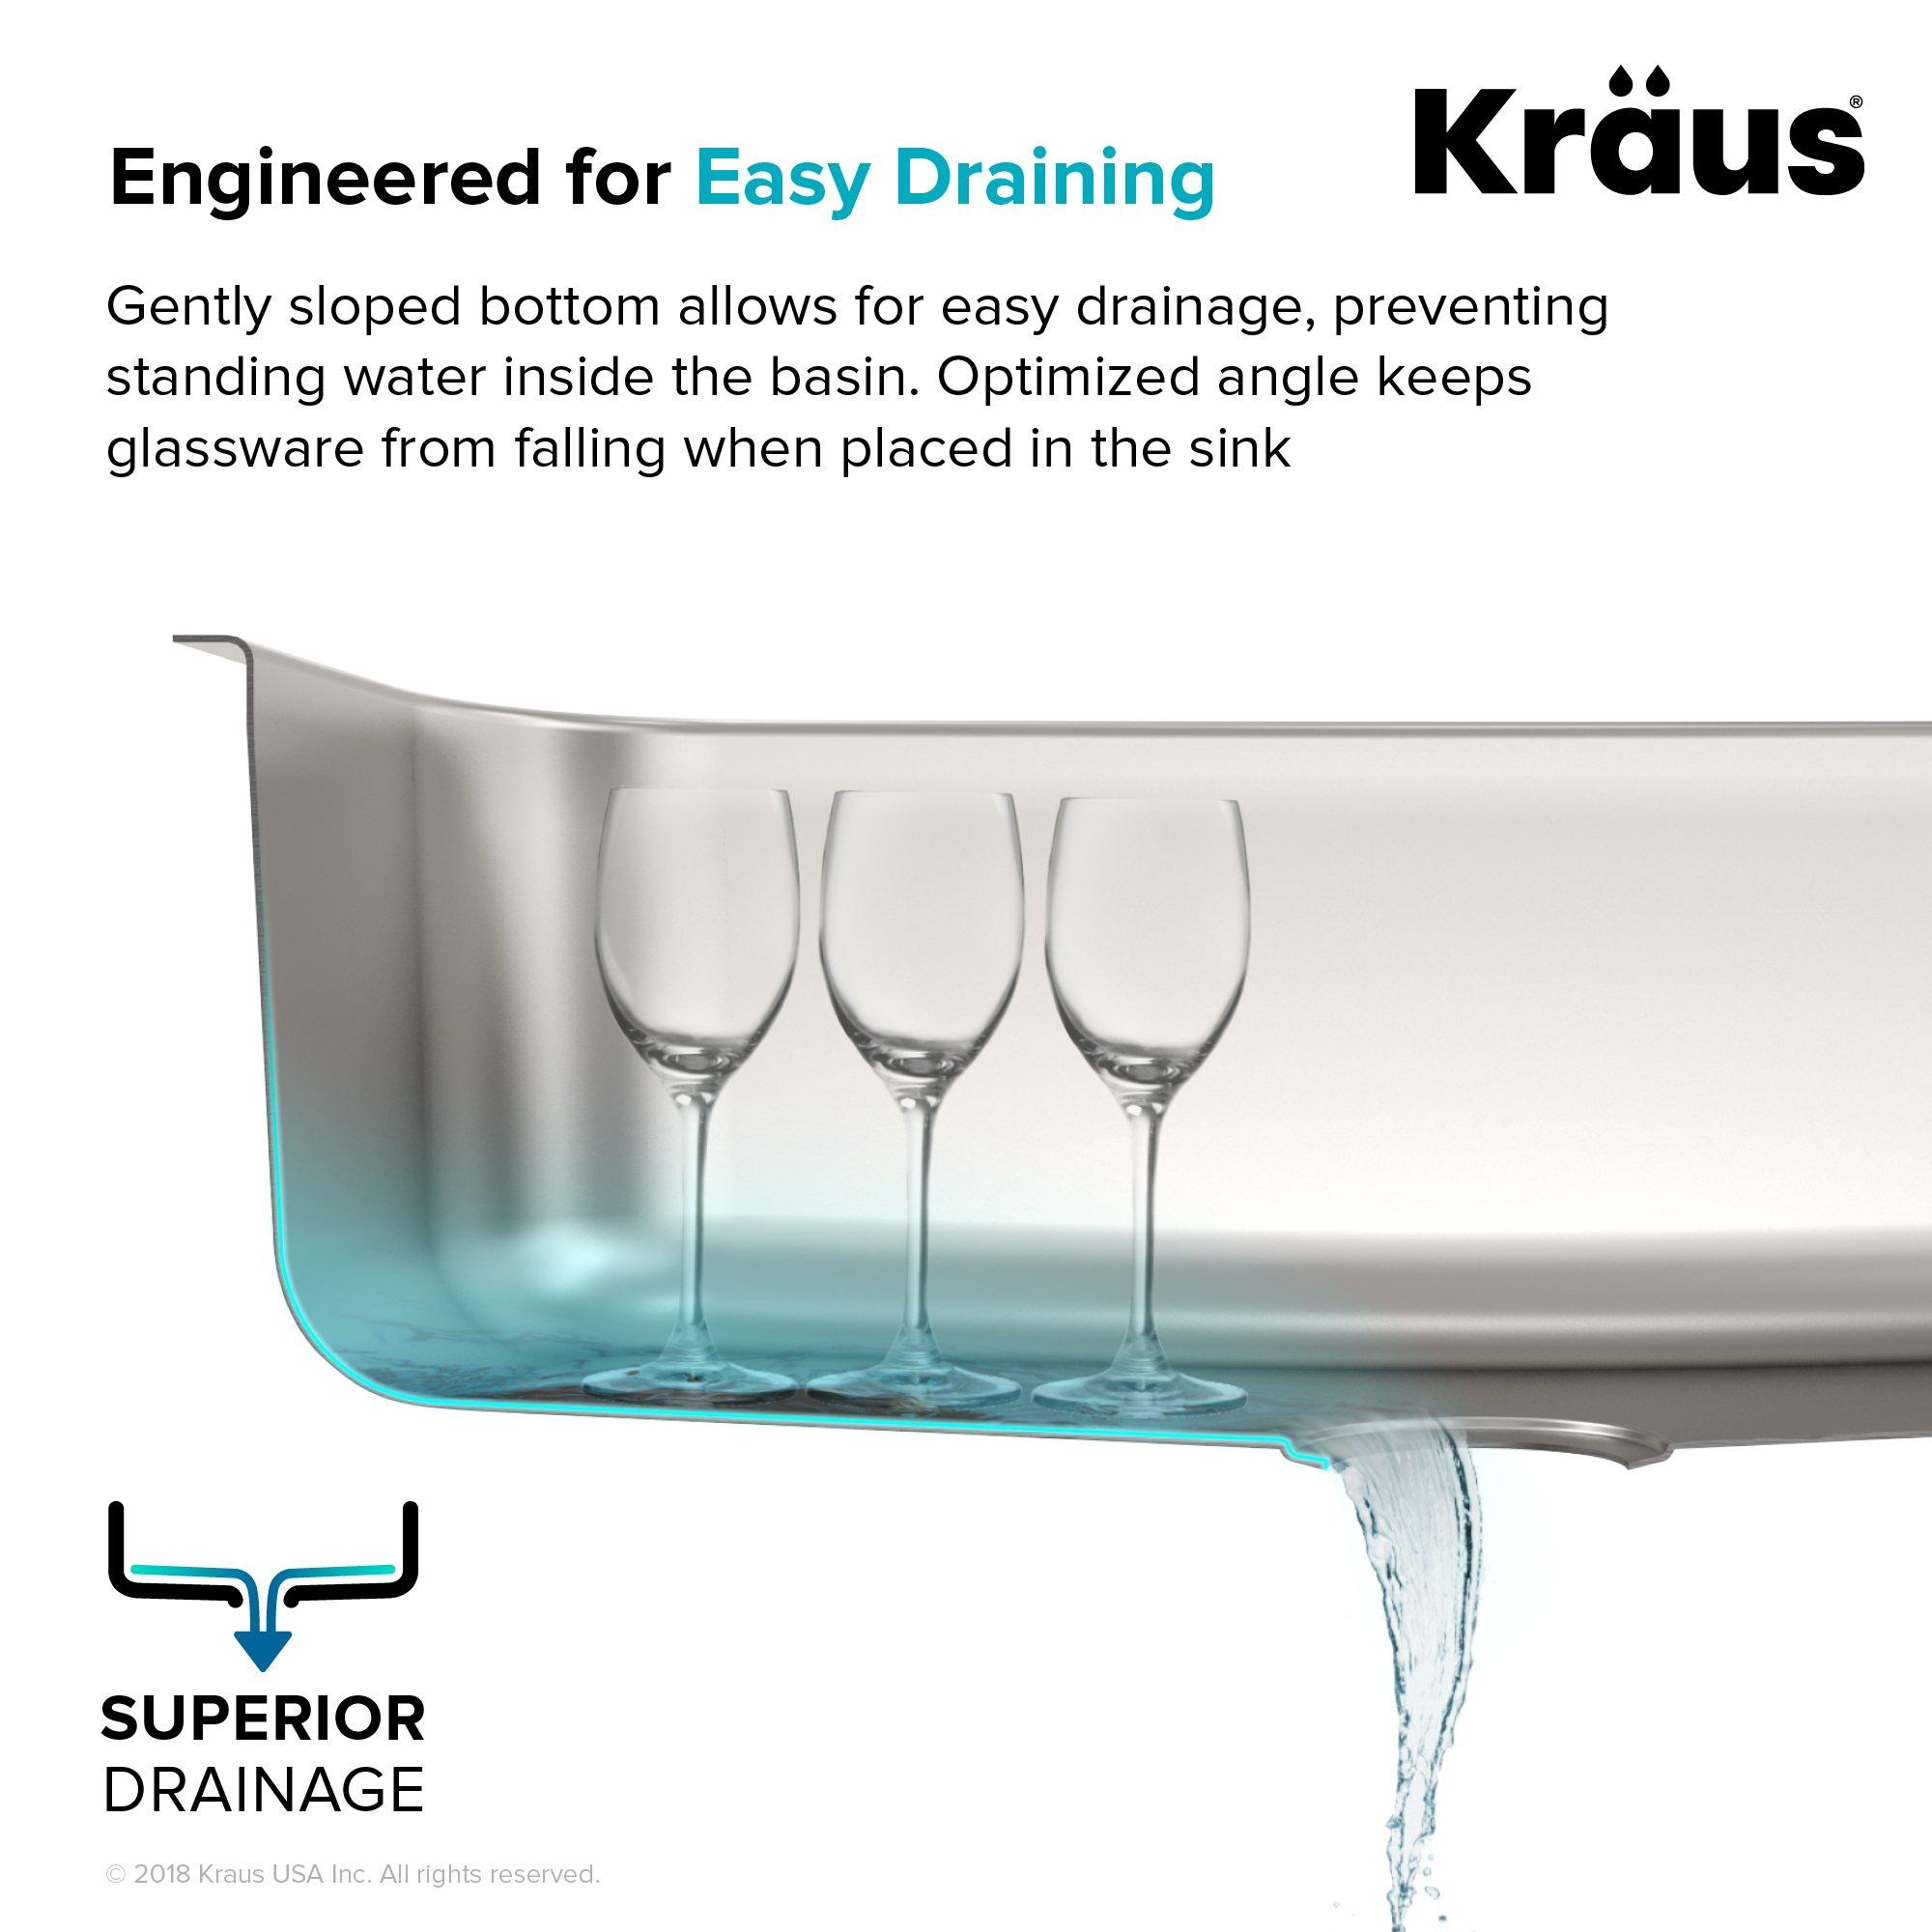 Kraus KBU14 31-1/2 inch Undermount Single Bowl 16-gauge Stainless Steel Kitchen Sink by Kraus (Image #6)